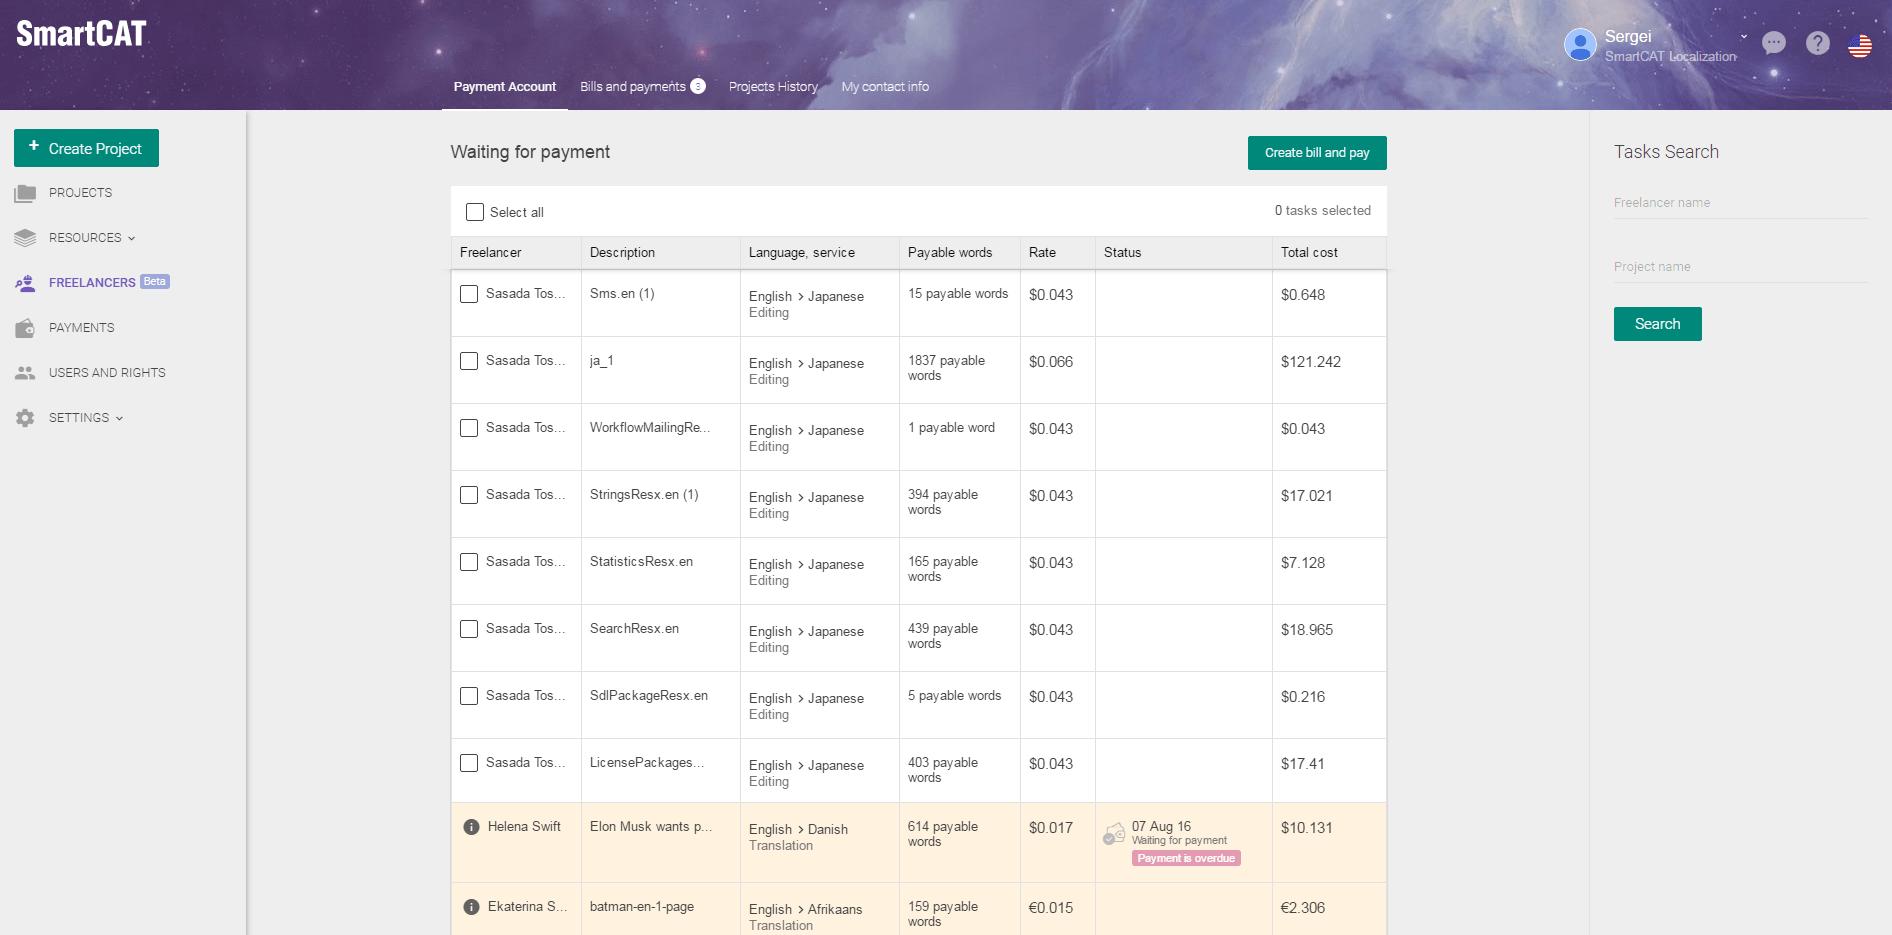 Payments_en-1024x506.png